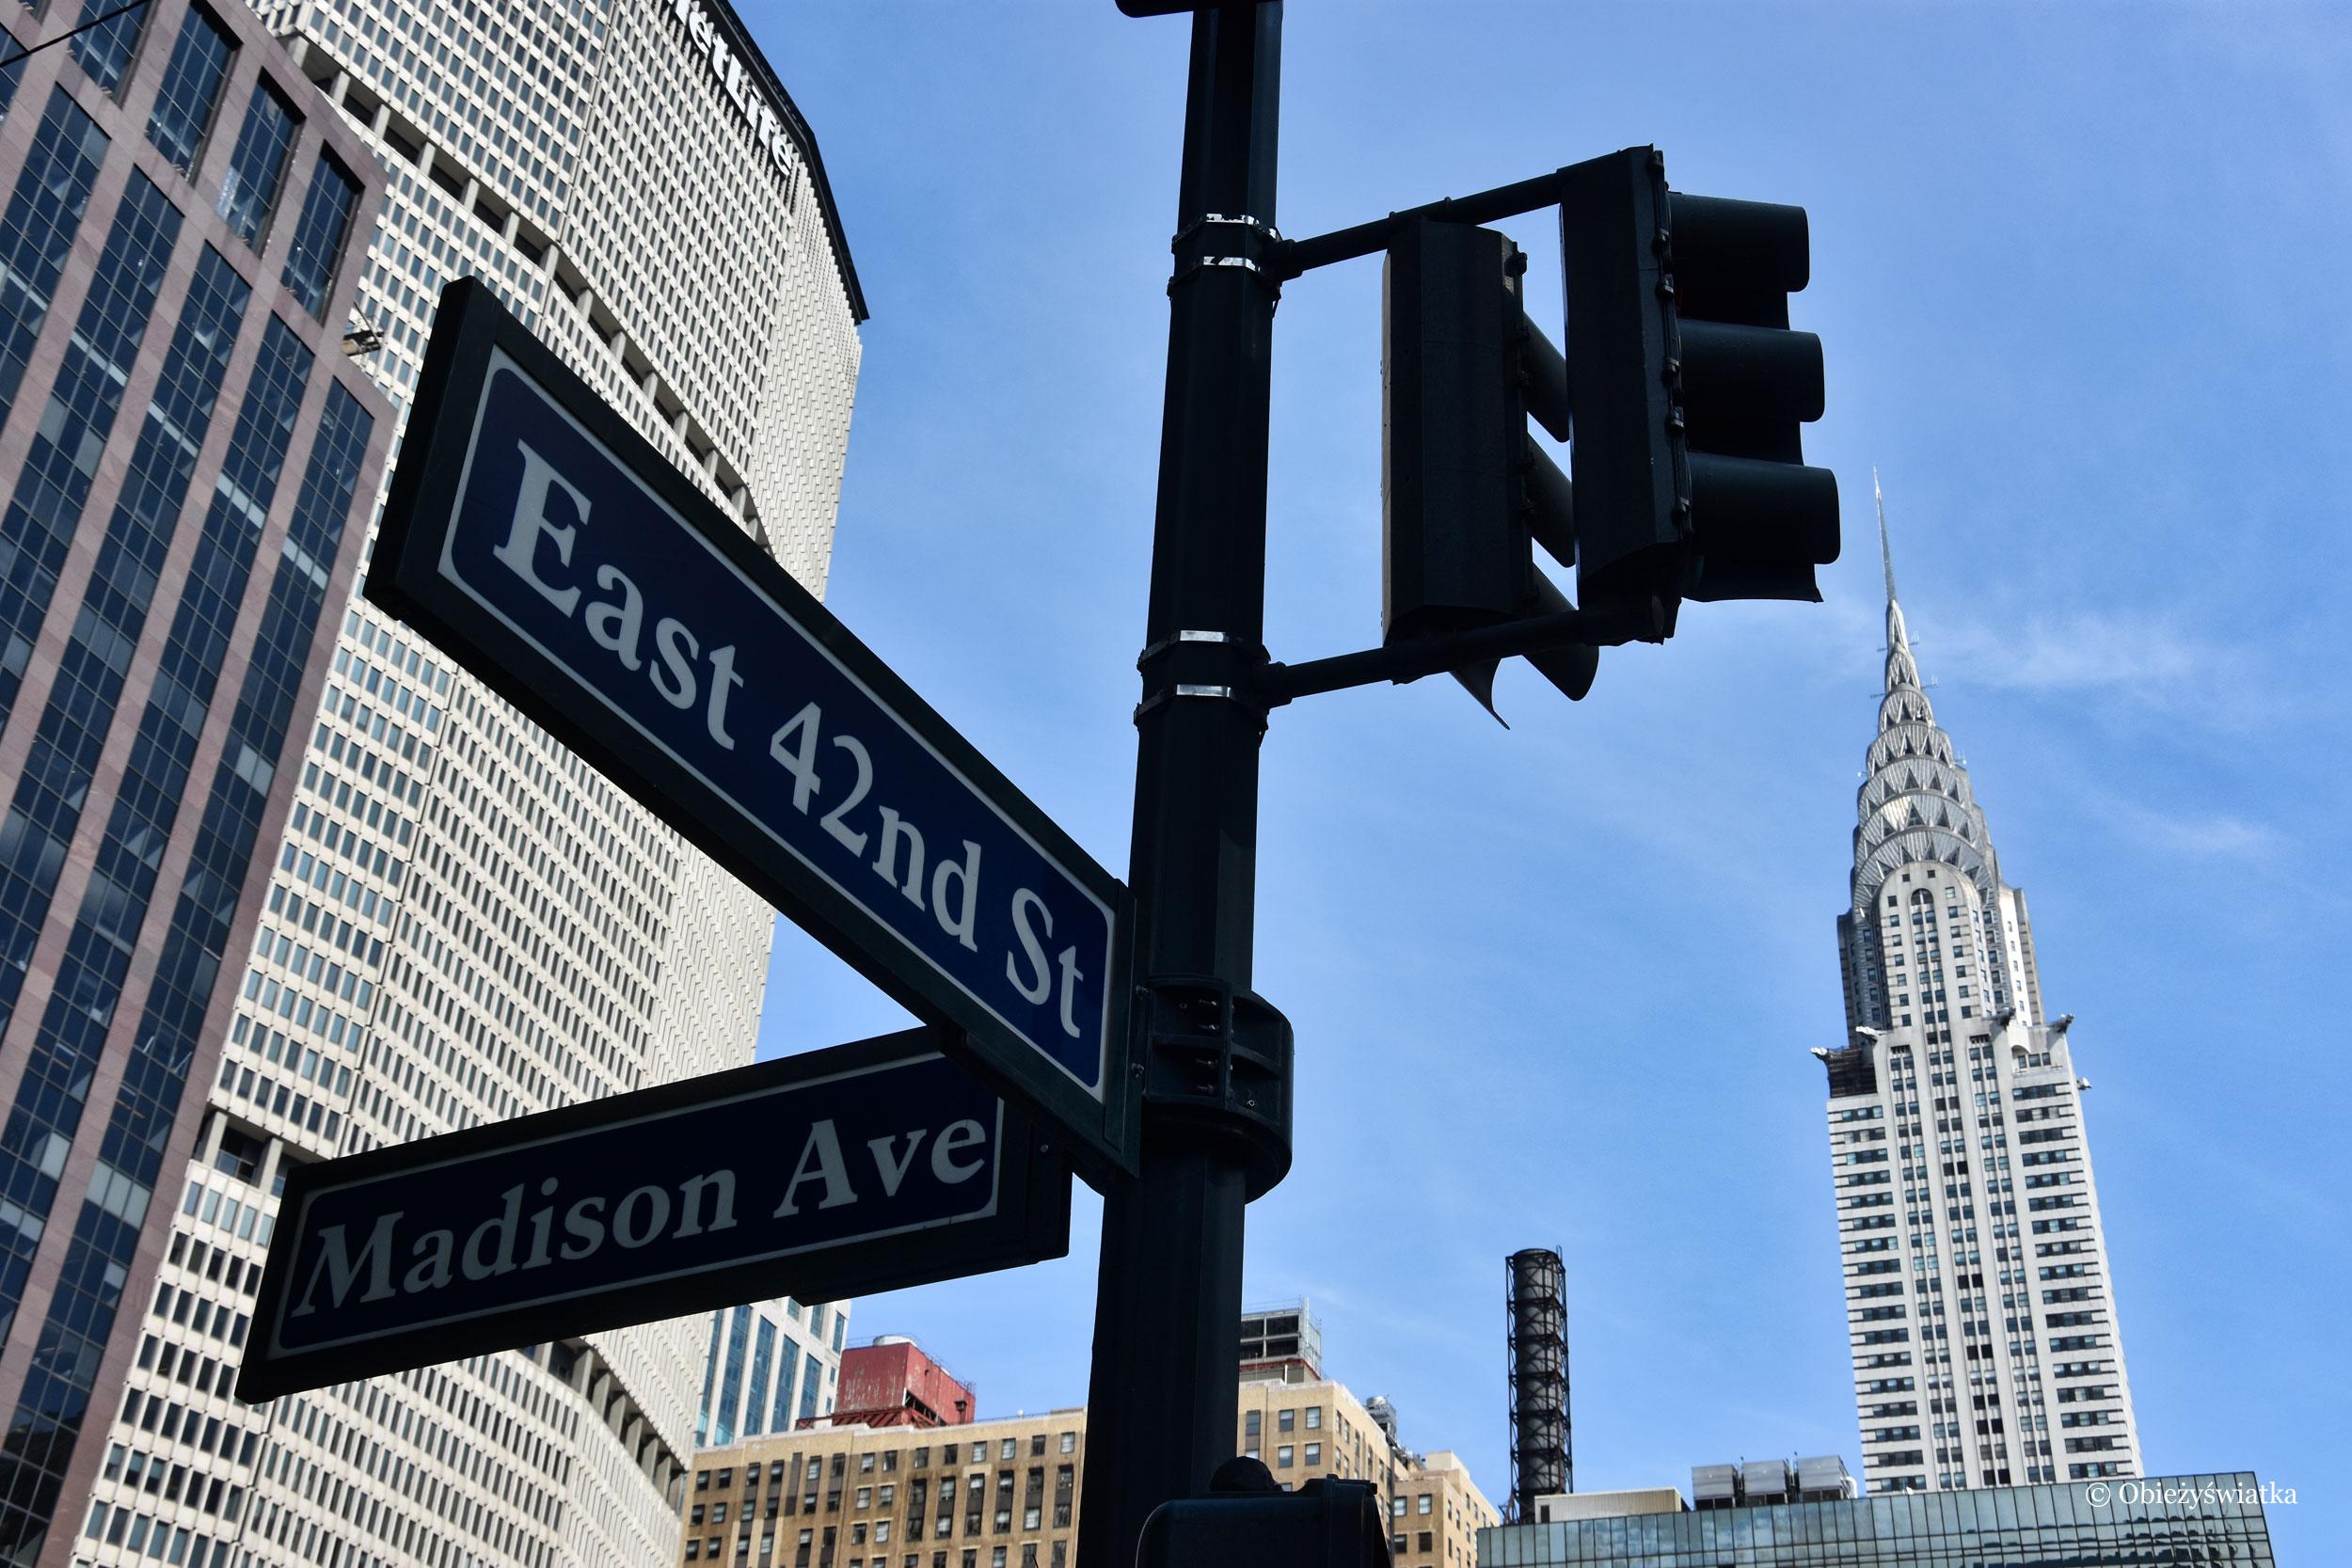 Skrzyżowanie Madison Ave i East 42nd Street, NYC